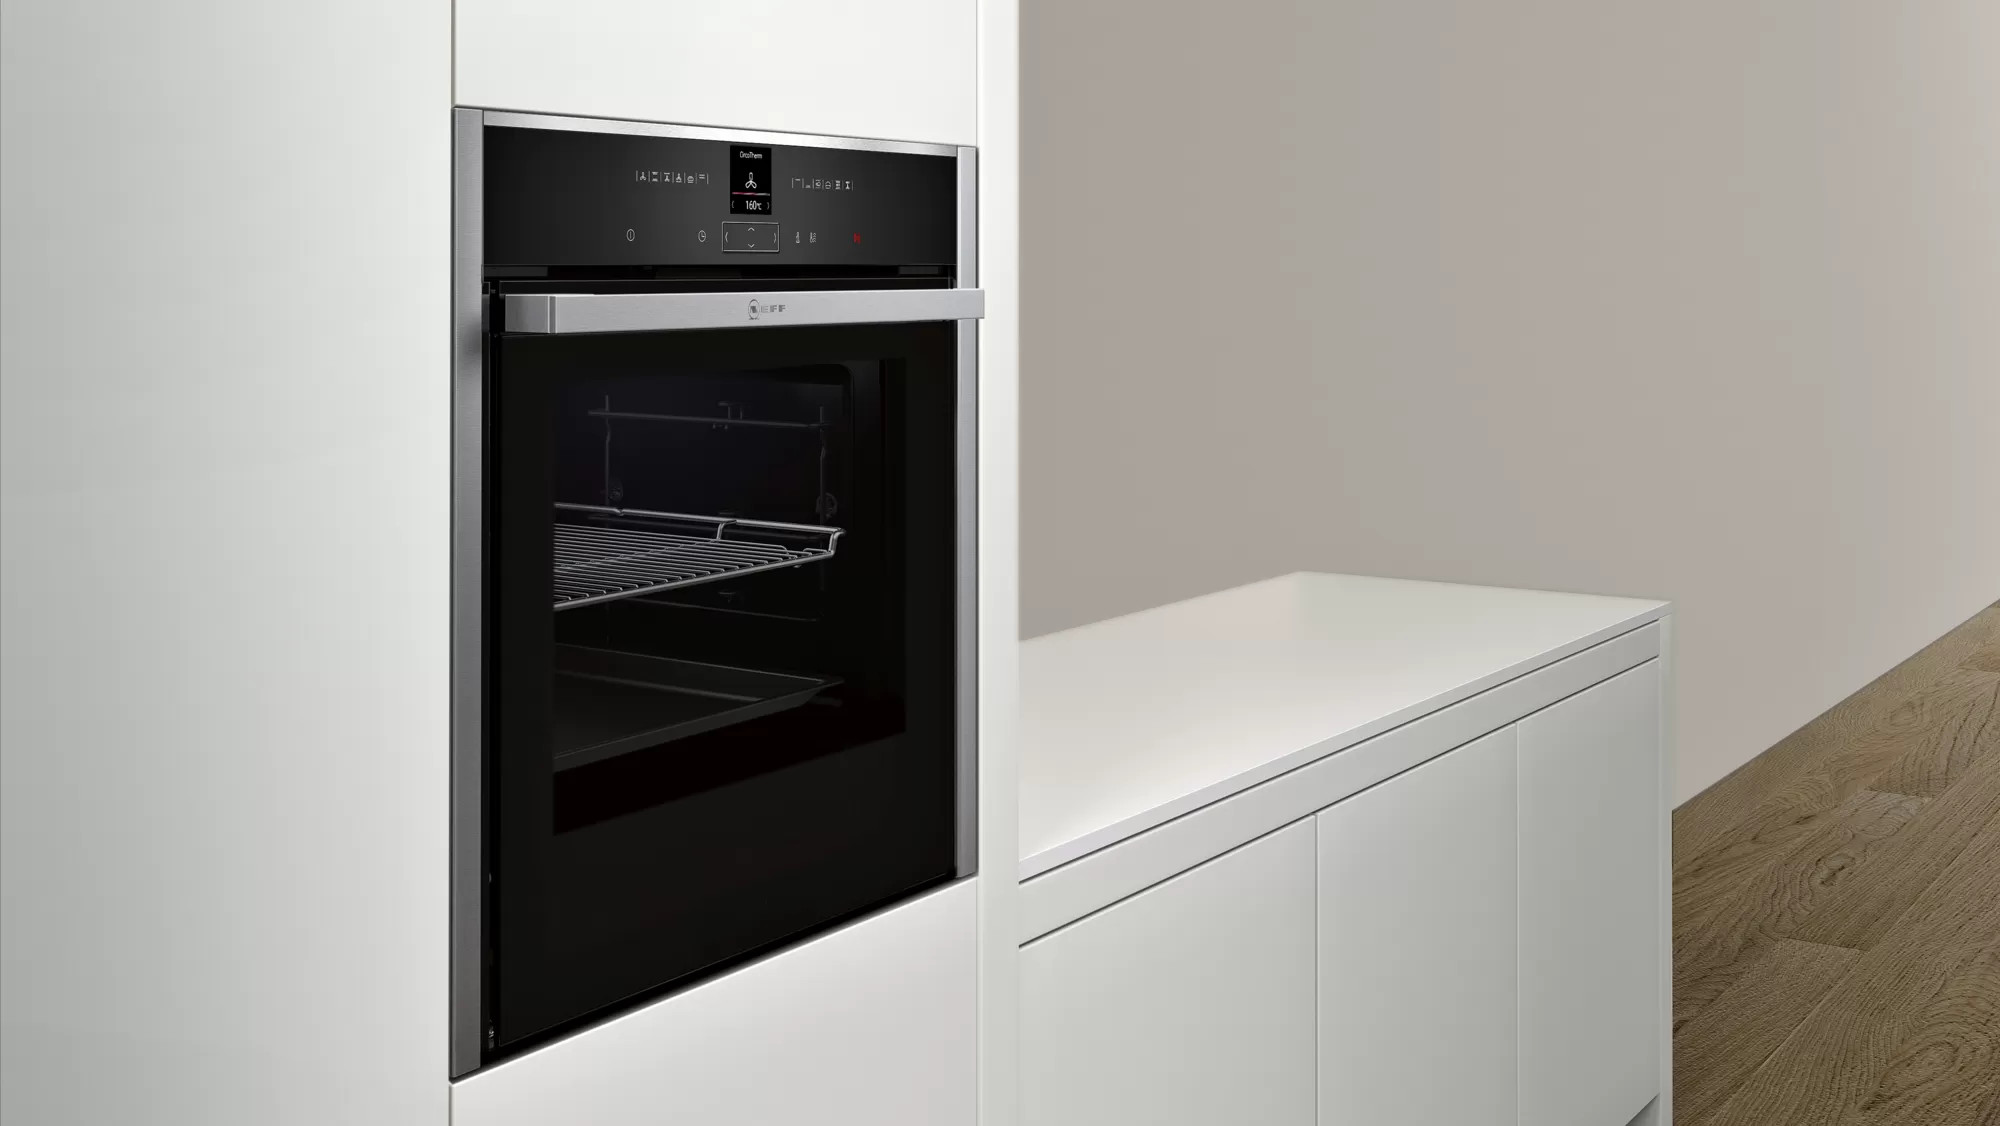 Встраиваемый духовой шкаф Neff B57CR22N0